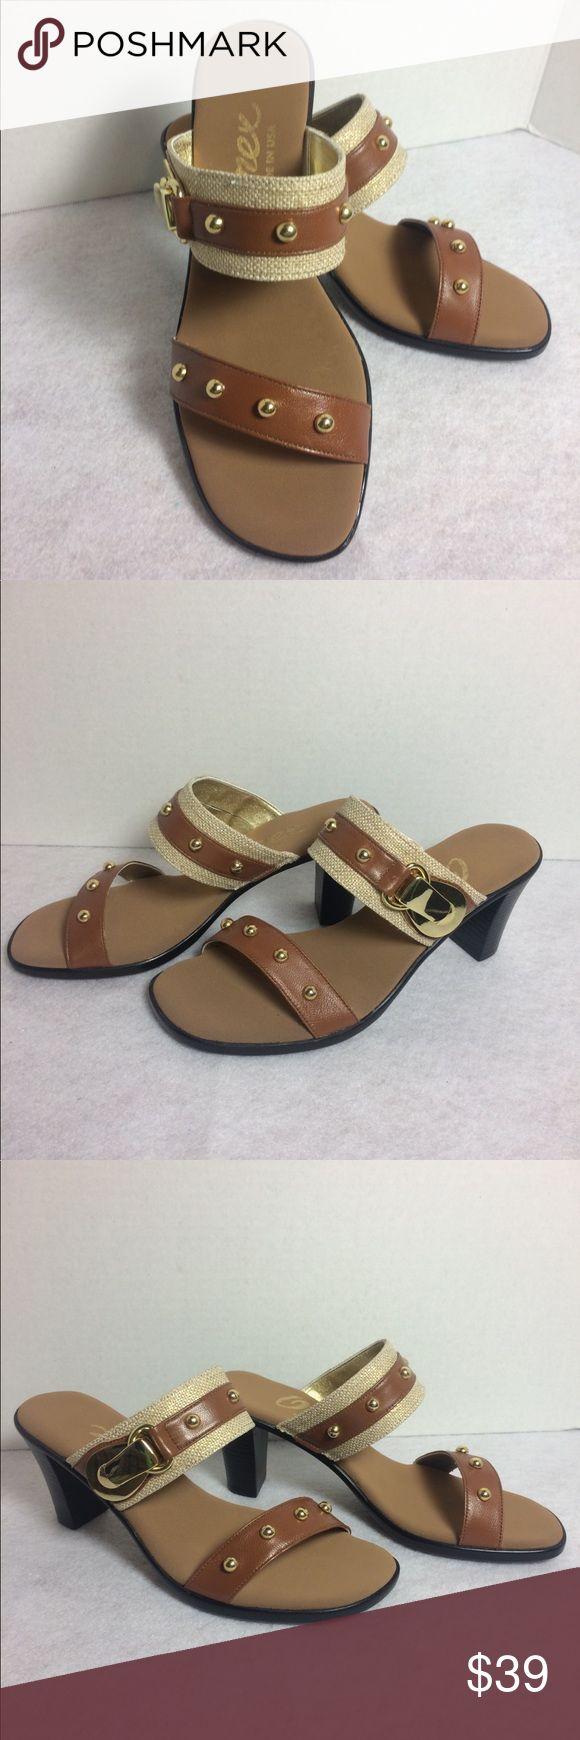 👡 Onex Tan slip on heals size 6 NIB 👡 Onex Tan slip on heals size 6 NEW! With box! Never worn! Onex Shoes Heels